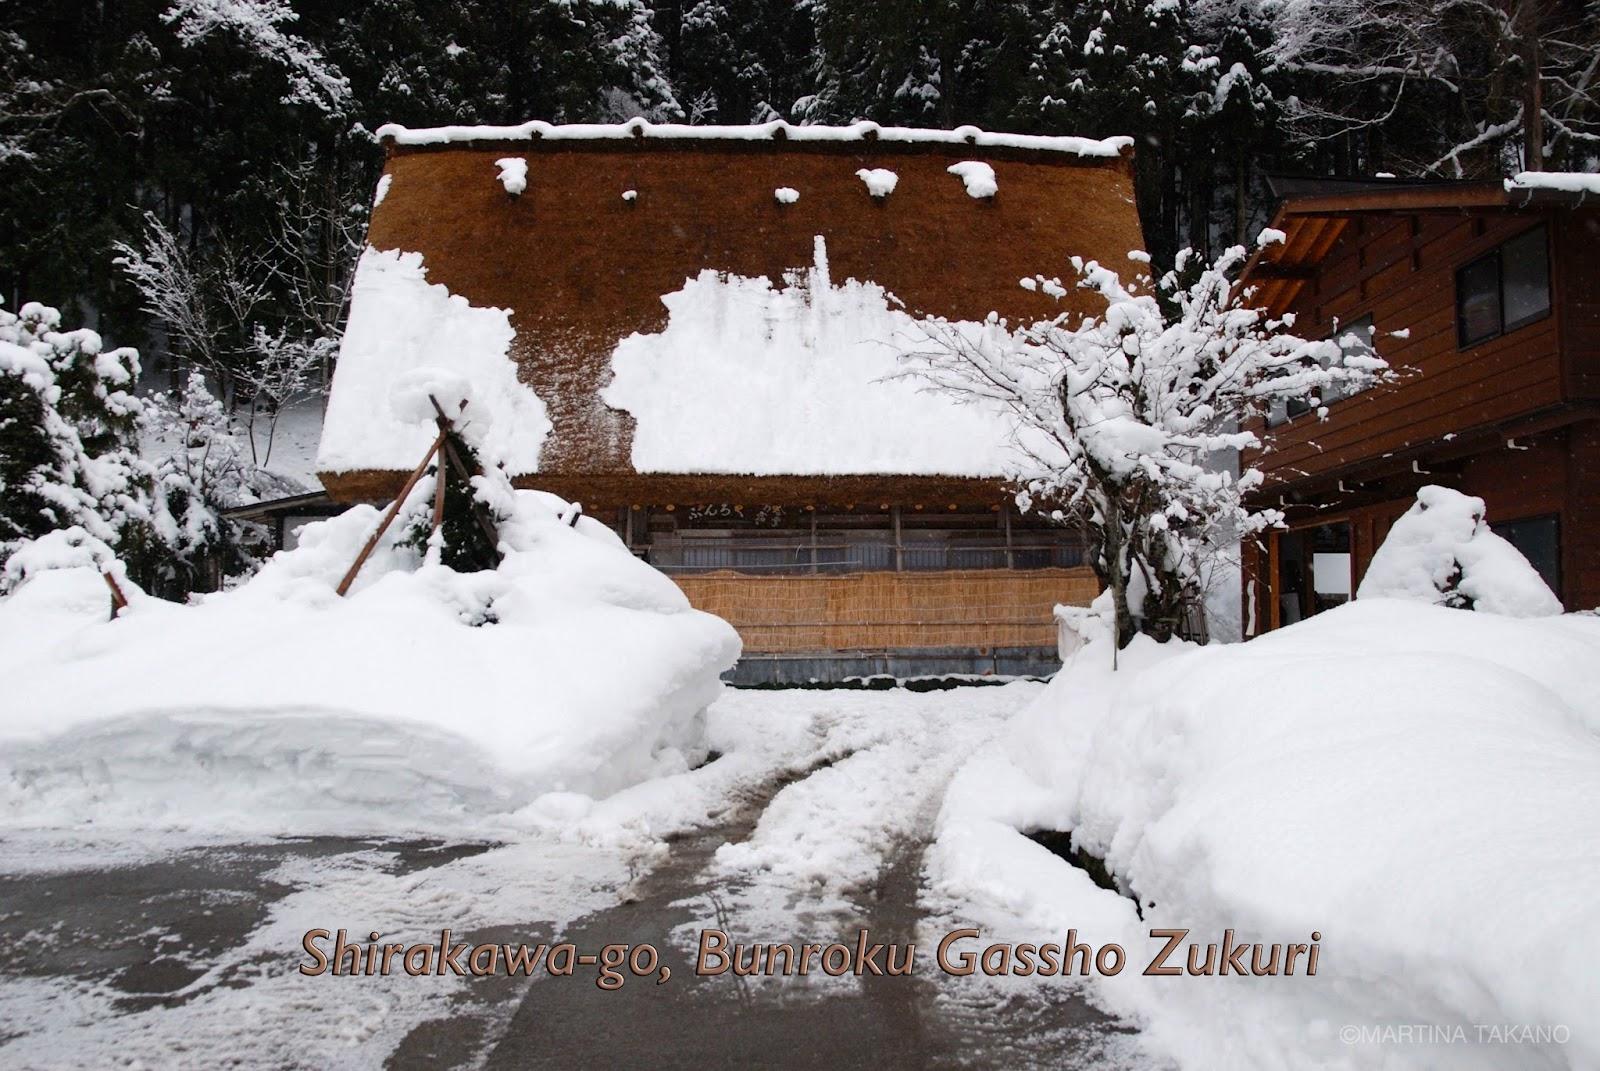 Leben in japan shirakawa japan for Traditionelles japanisches hotel